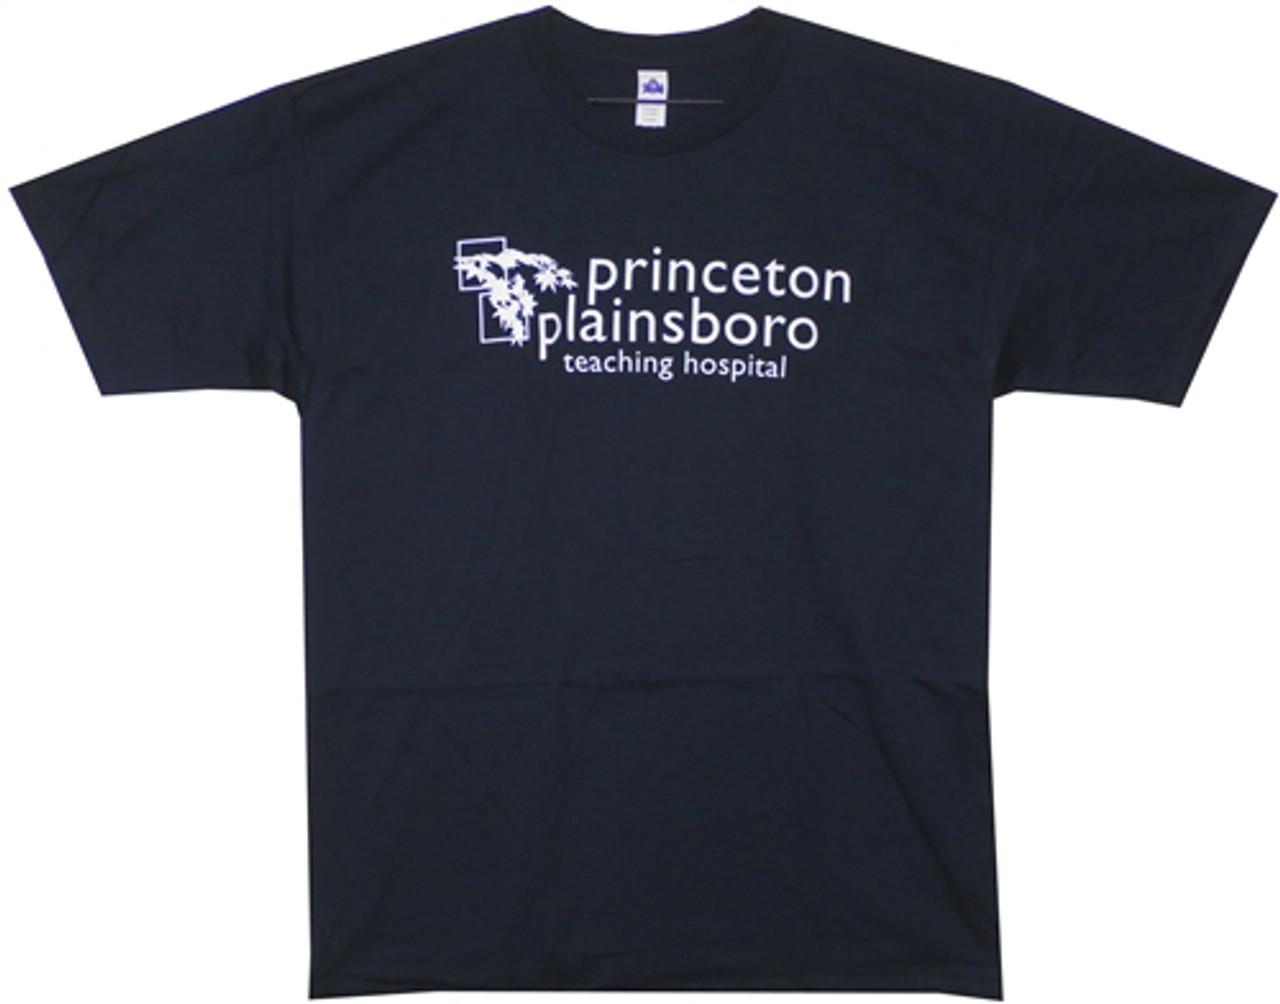 House TV Show PRINCETON PLAINSBORO Teaching Hospital T-Shirt All Sizes